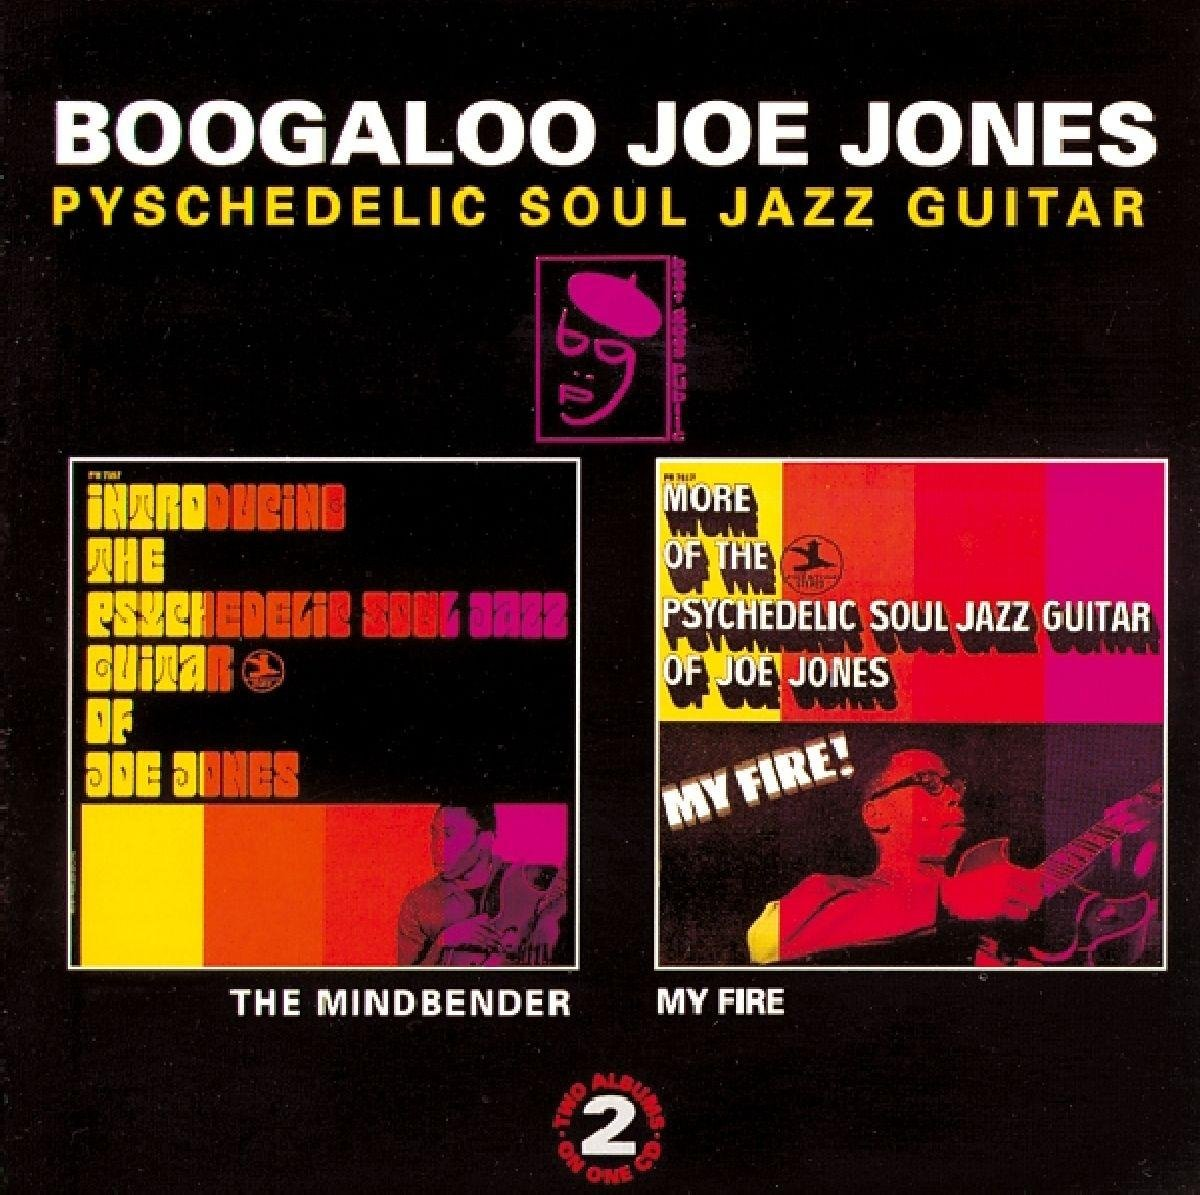 Boogaloo Joe Jones. The Mindbender / My Fire